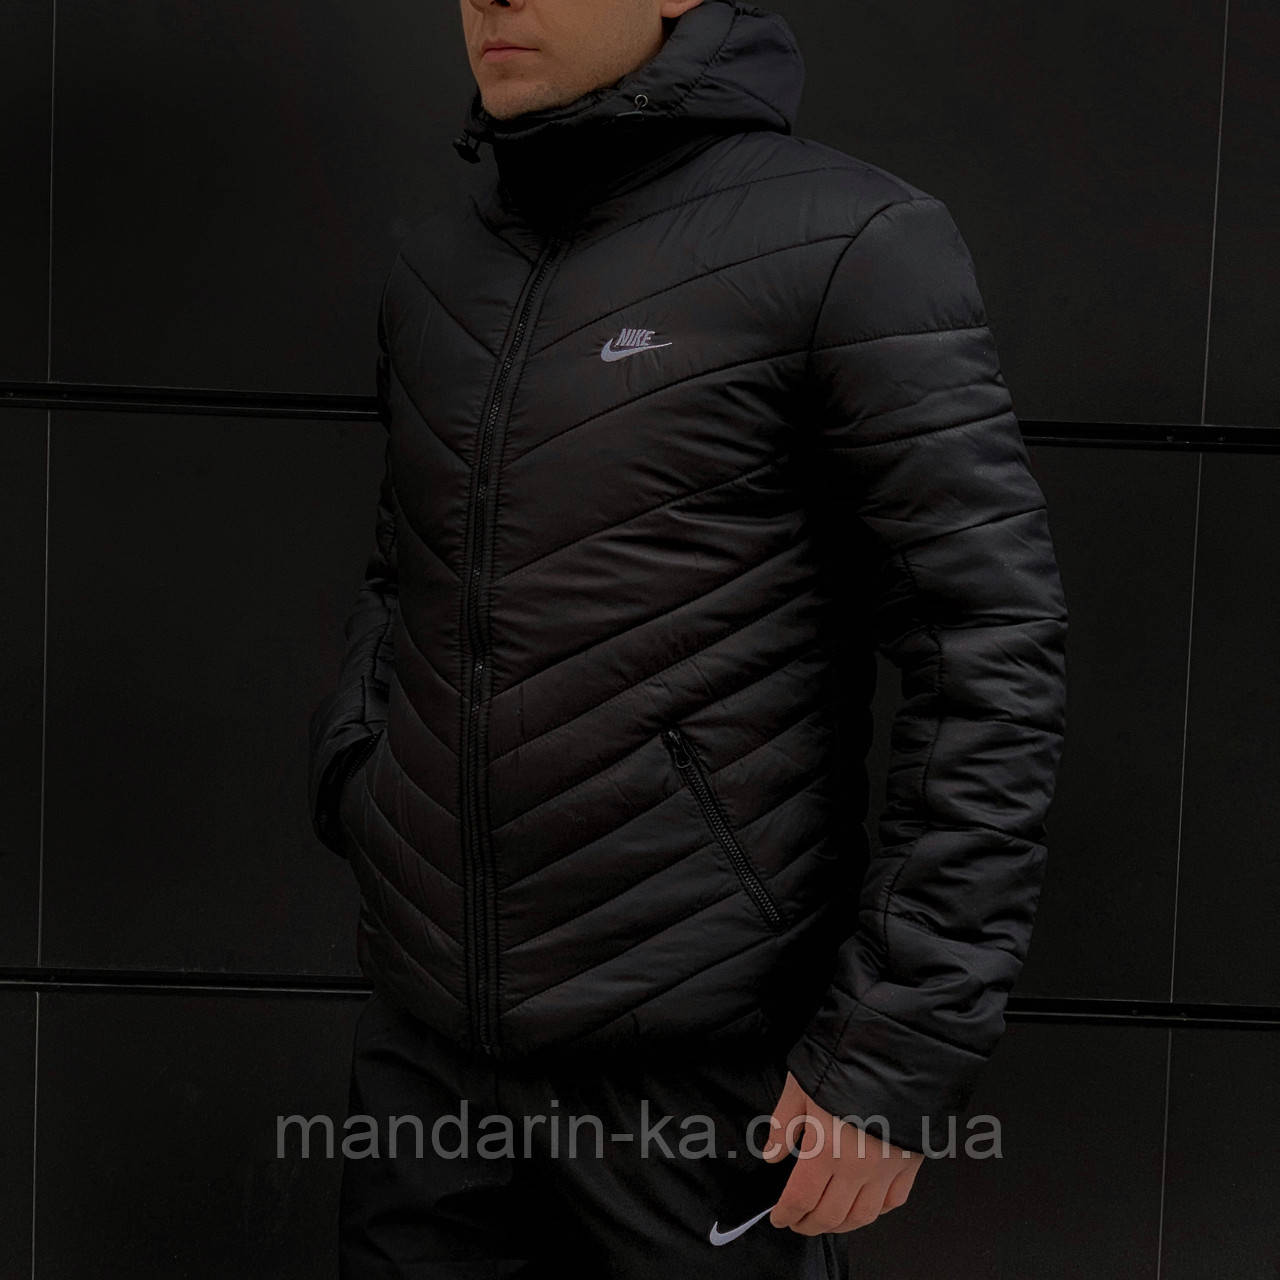 3baff84c Зимняя мужская куртка Nike Найк черная (реплика), цена 1 050 грн., купить  Київ — Prom.ua (ID#802451997)